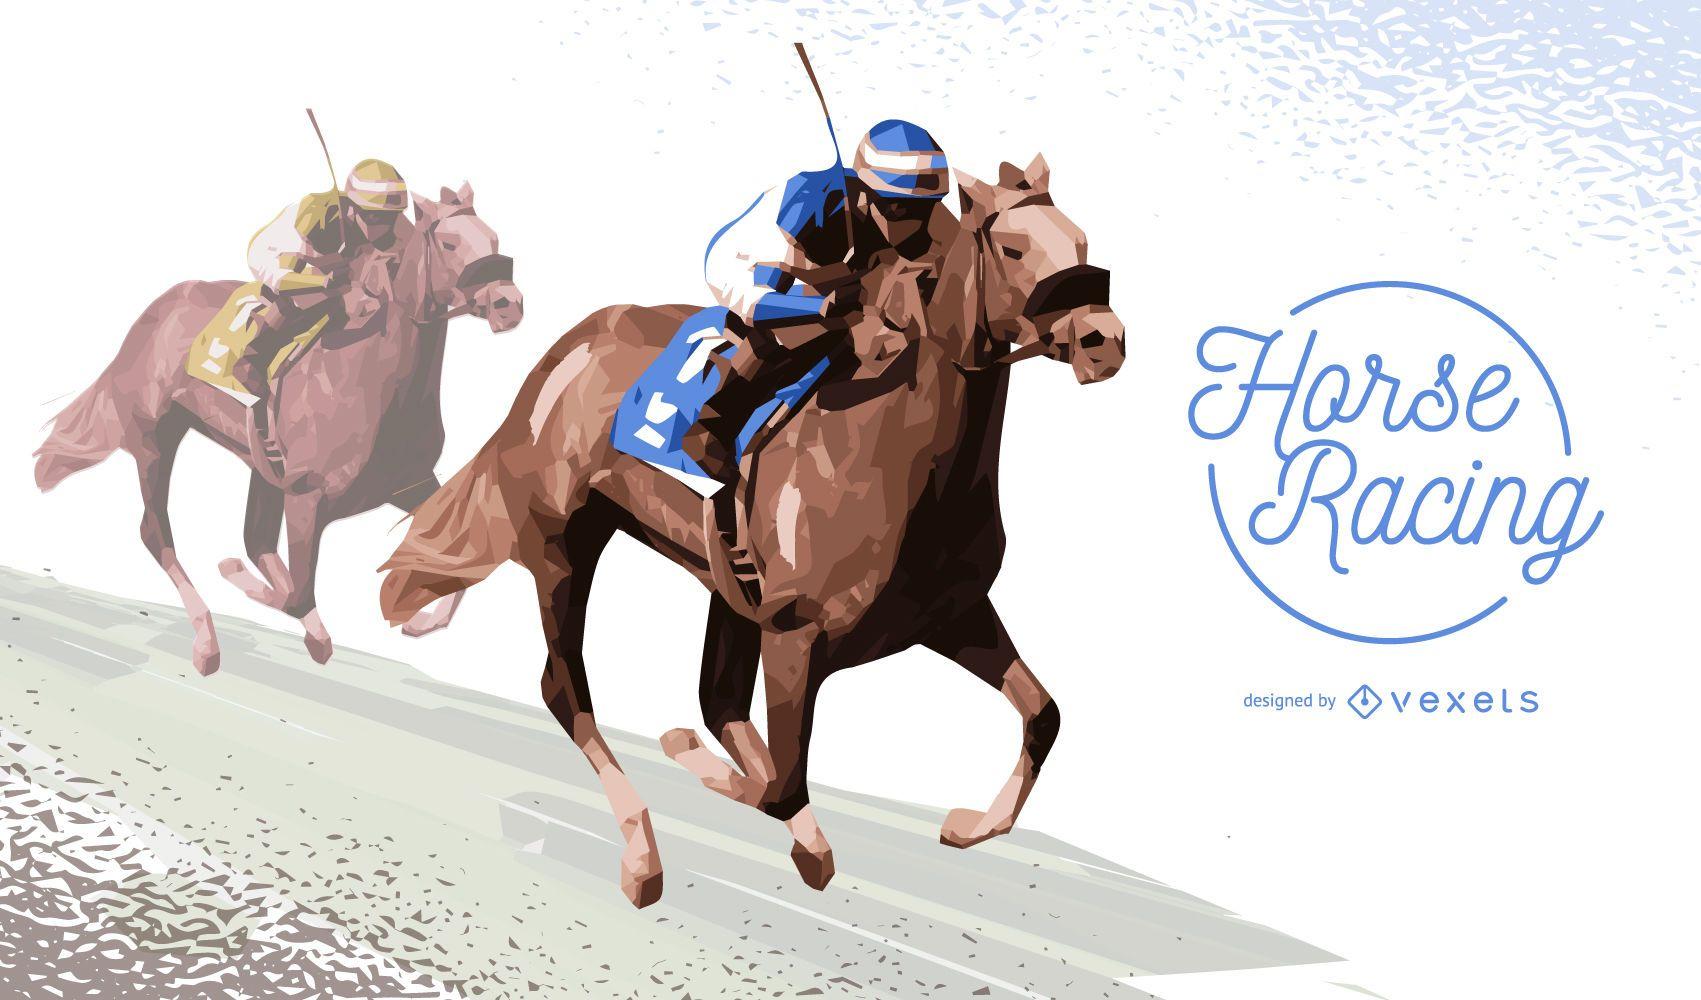 Two jockeys horse racing illustration